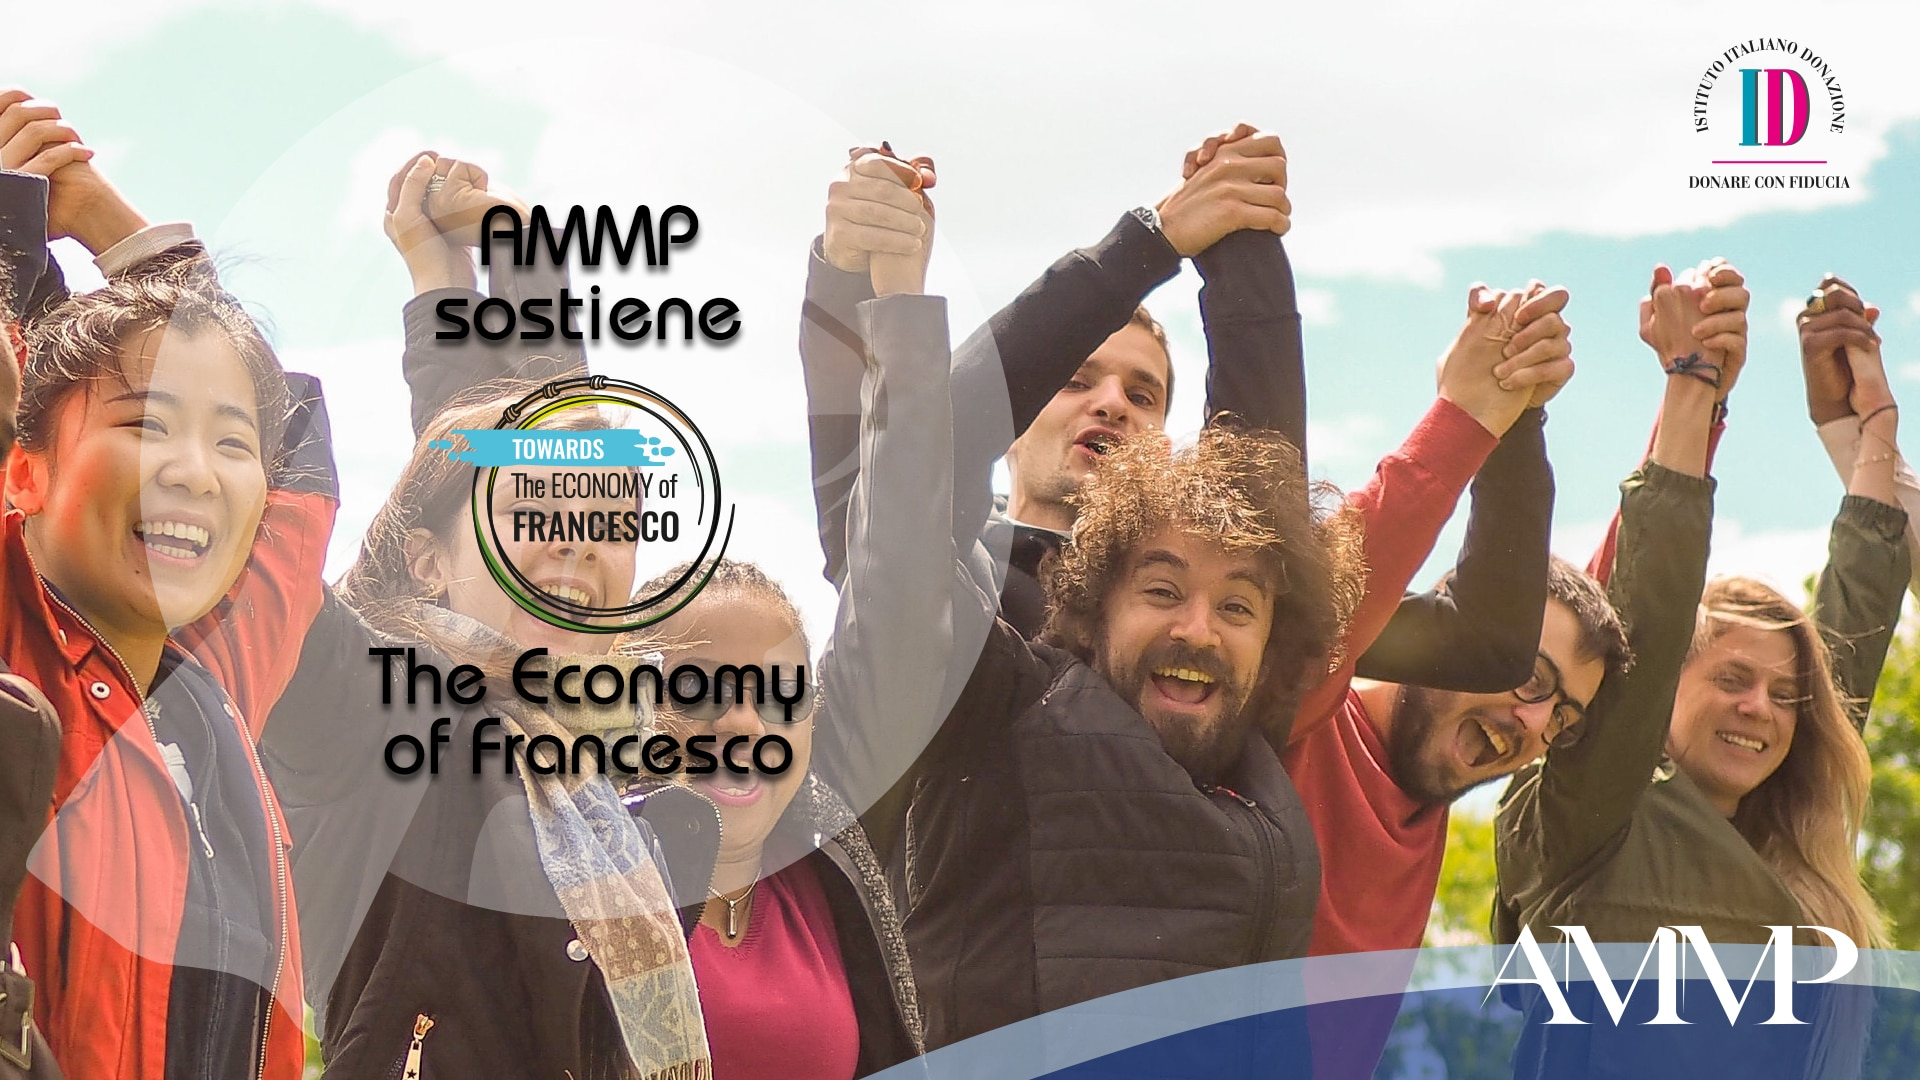 AMMP sostiene the Economy of Francesco